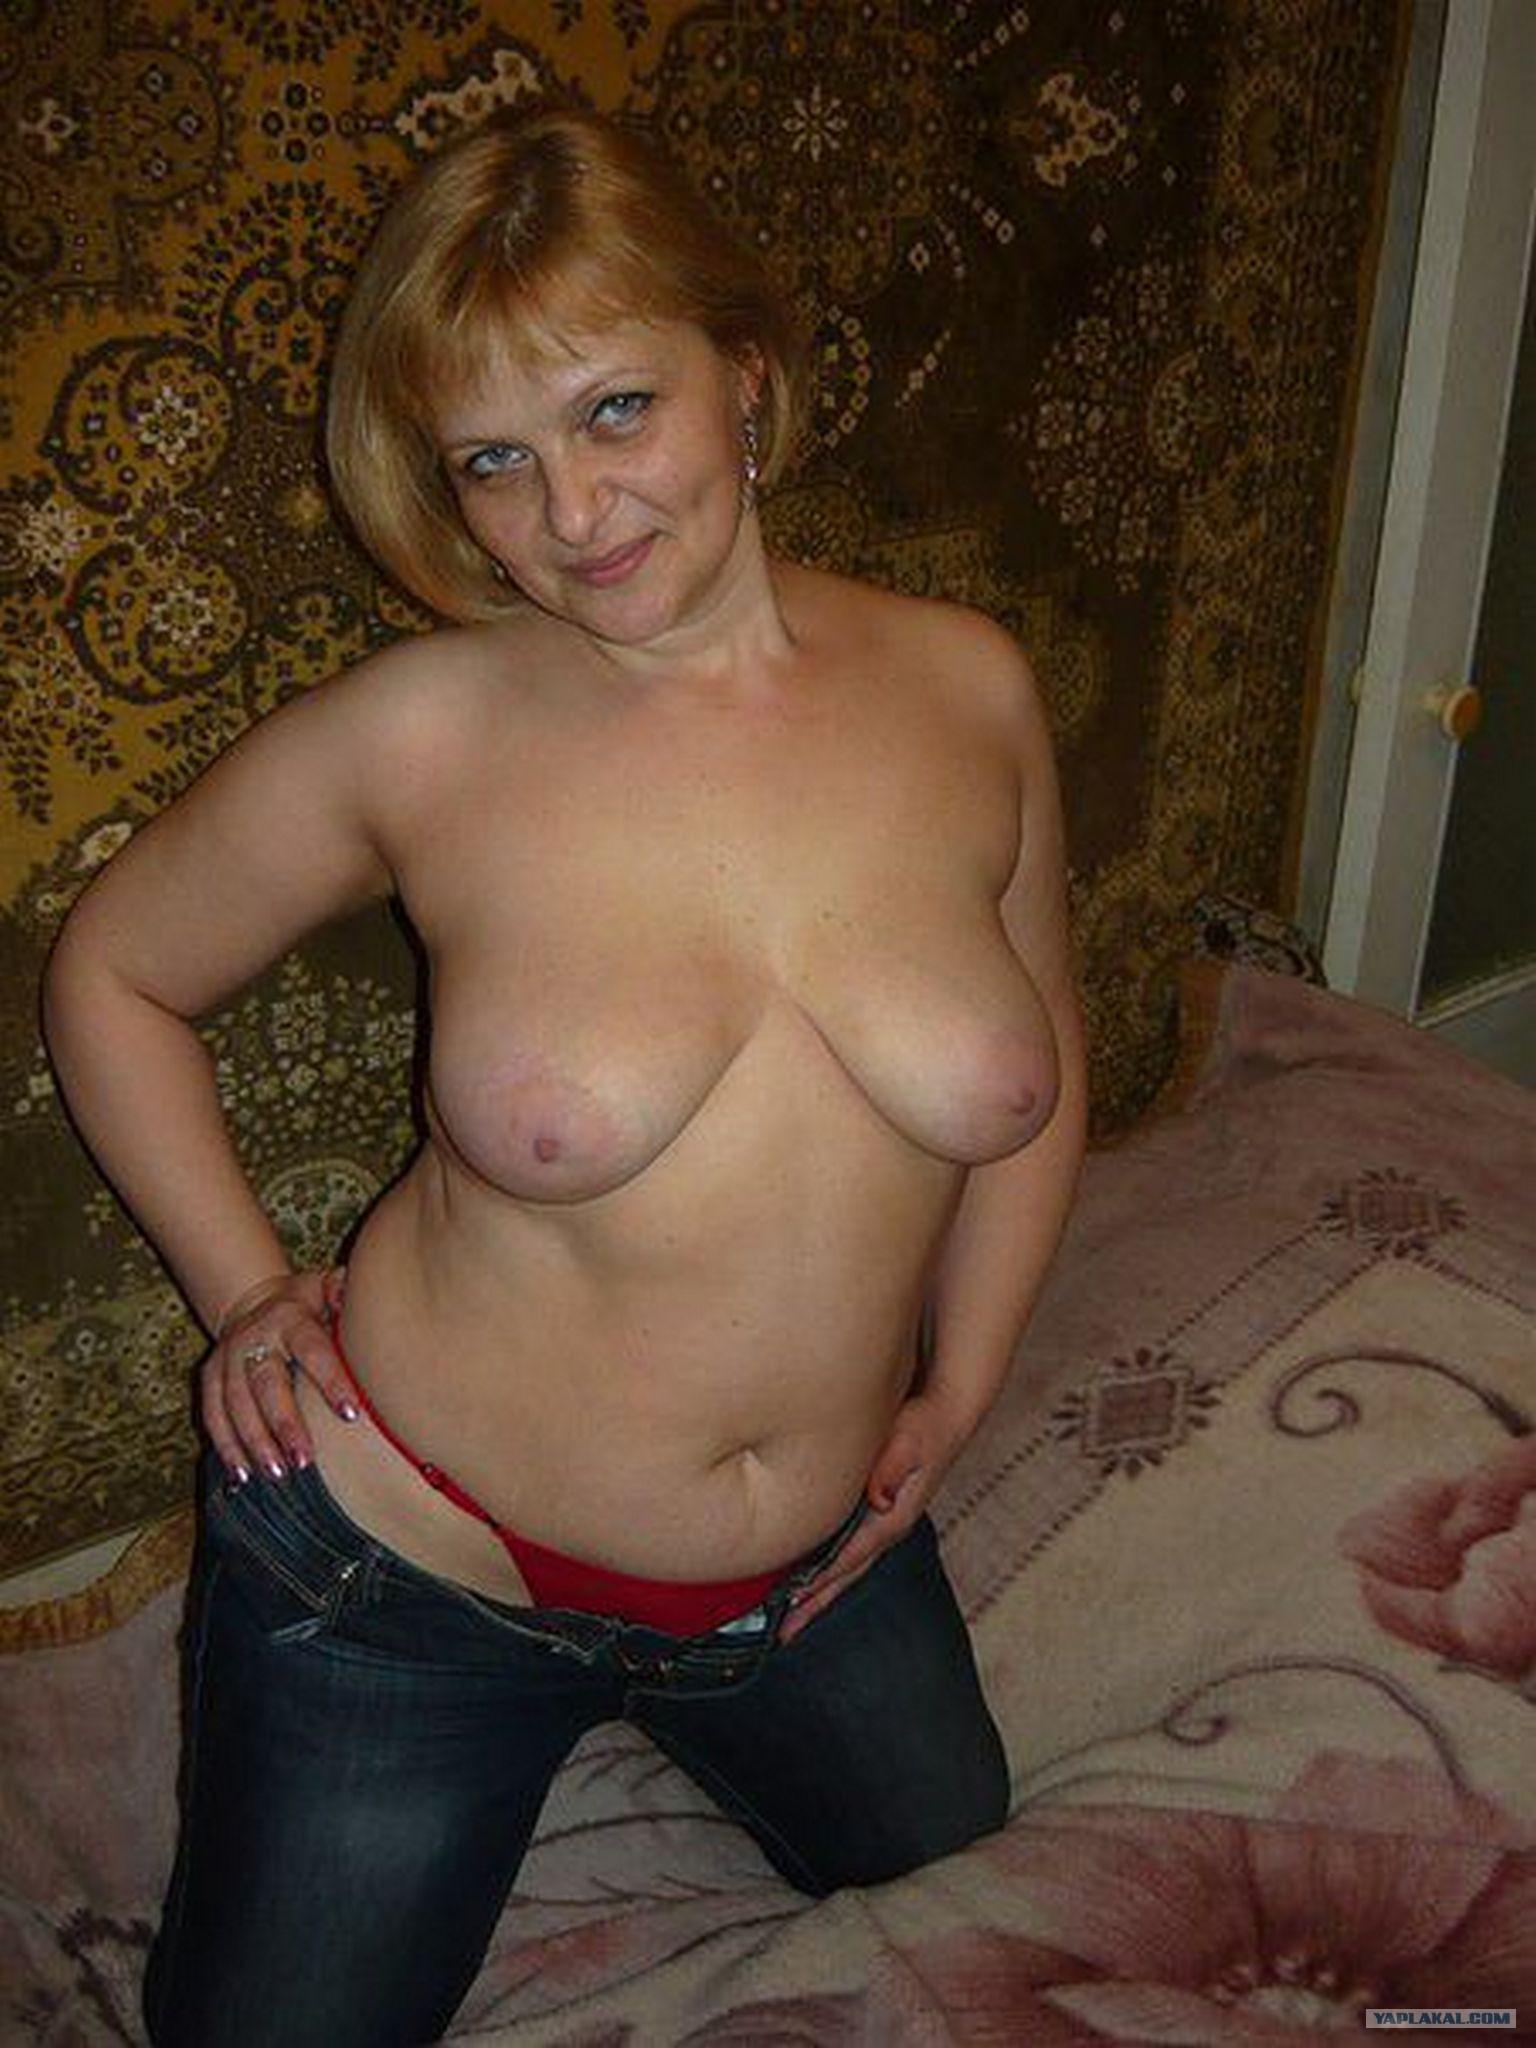 Тёти за 40 лет фото 21 фотография